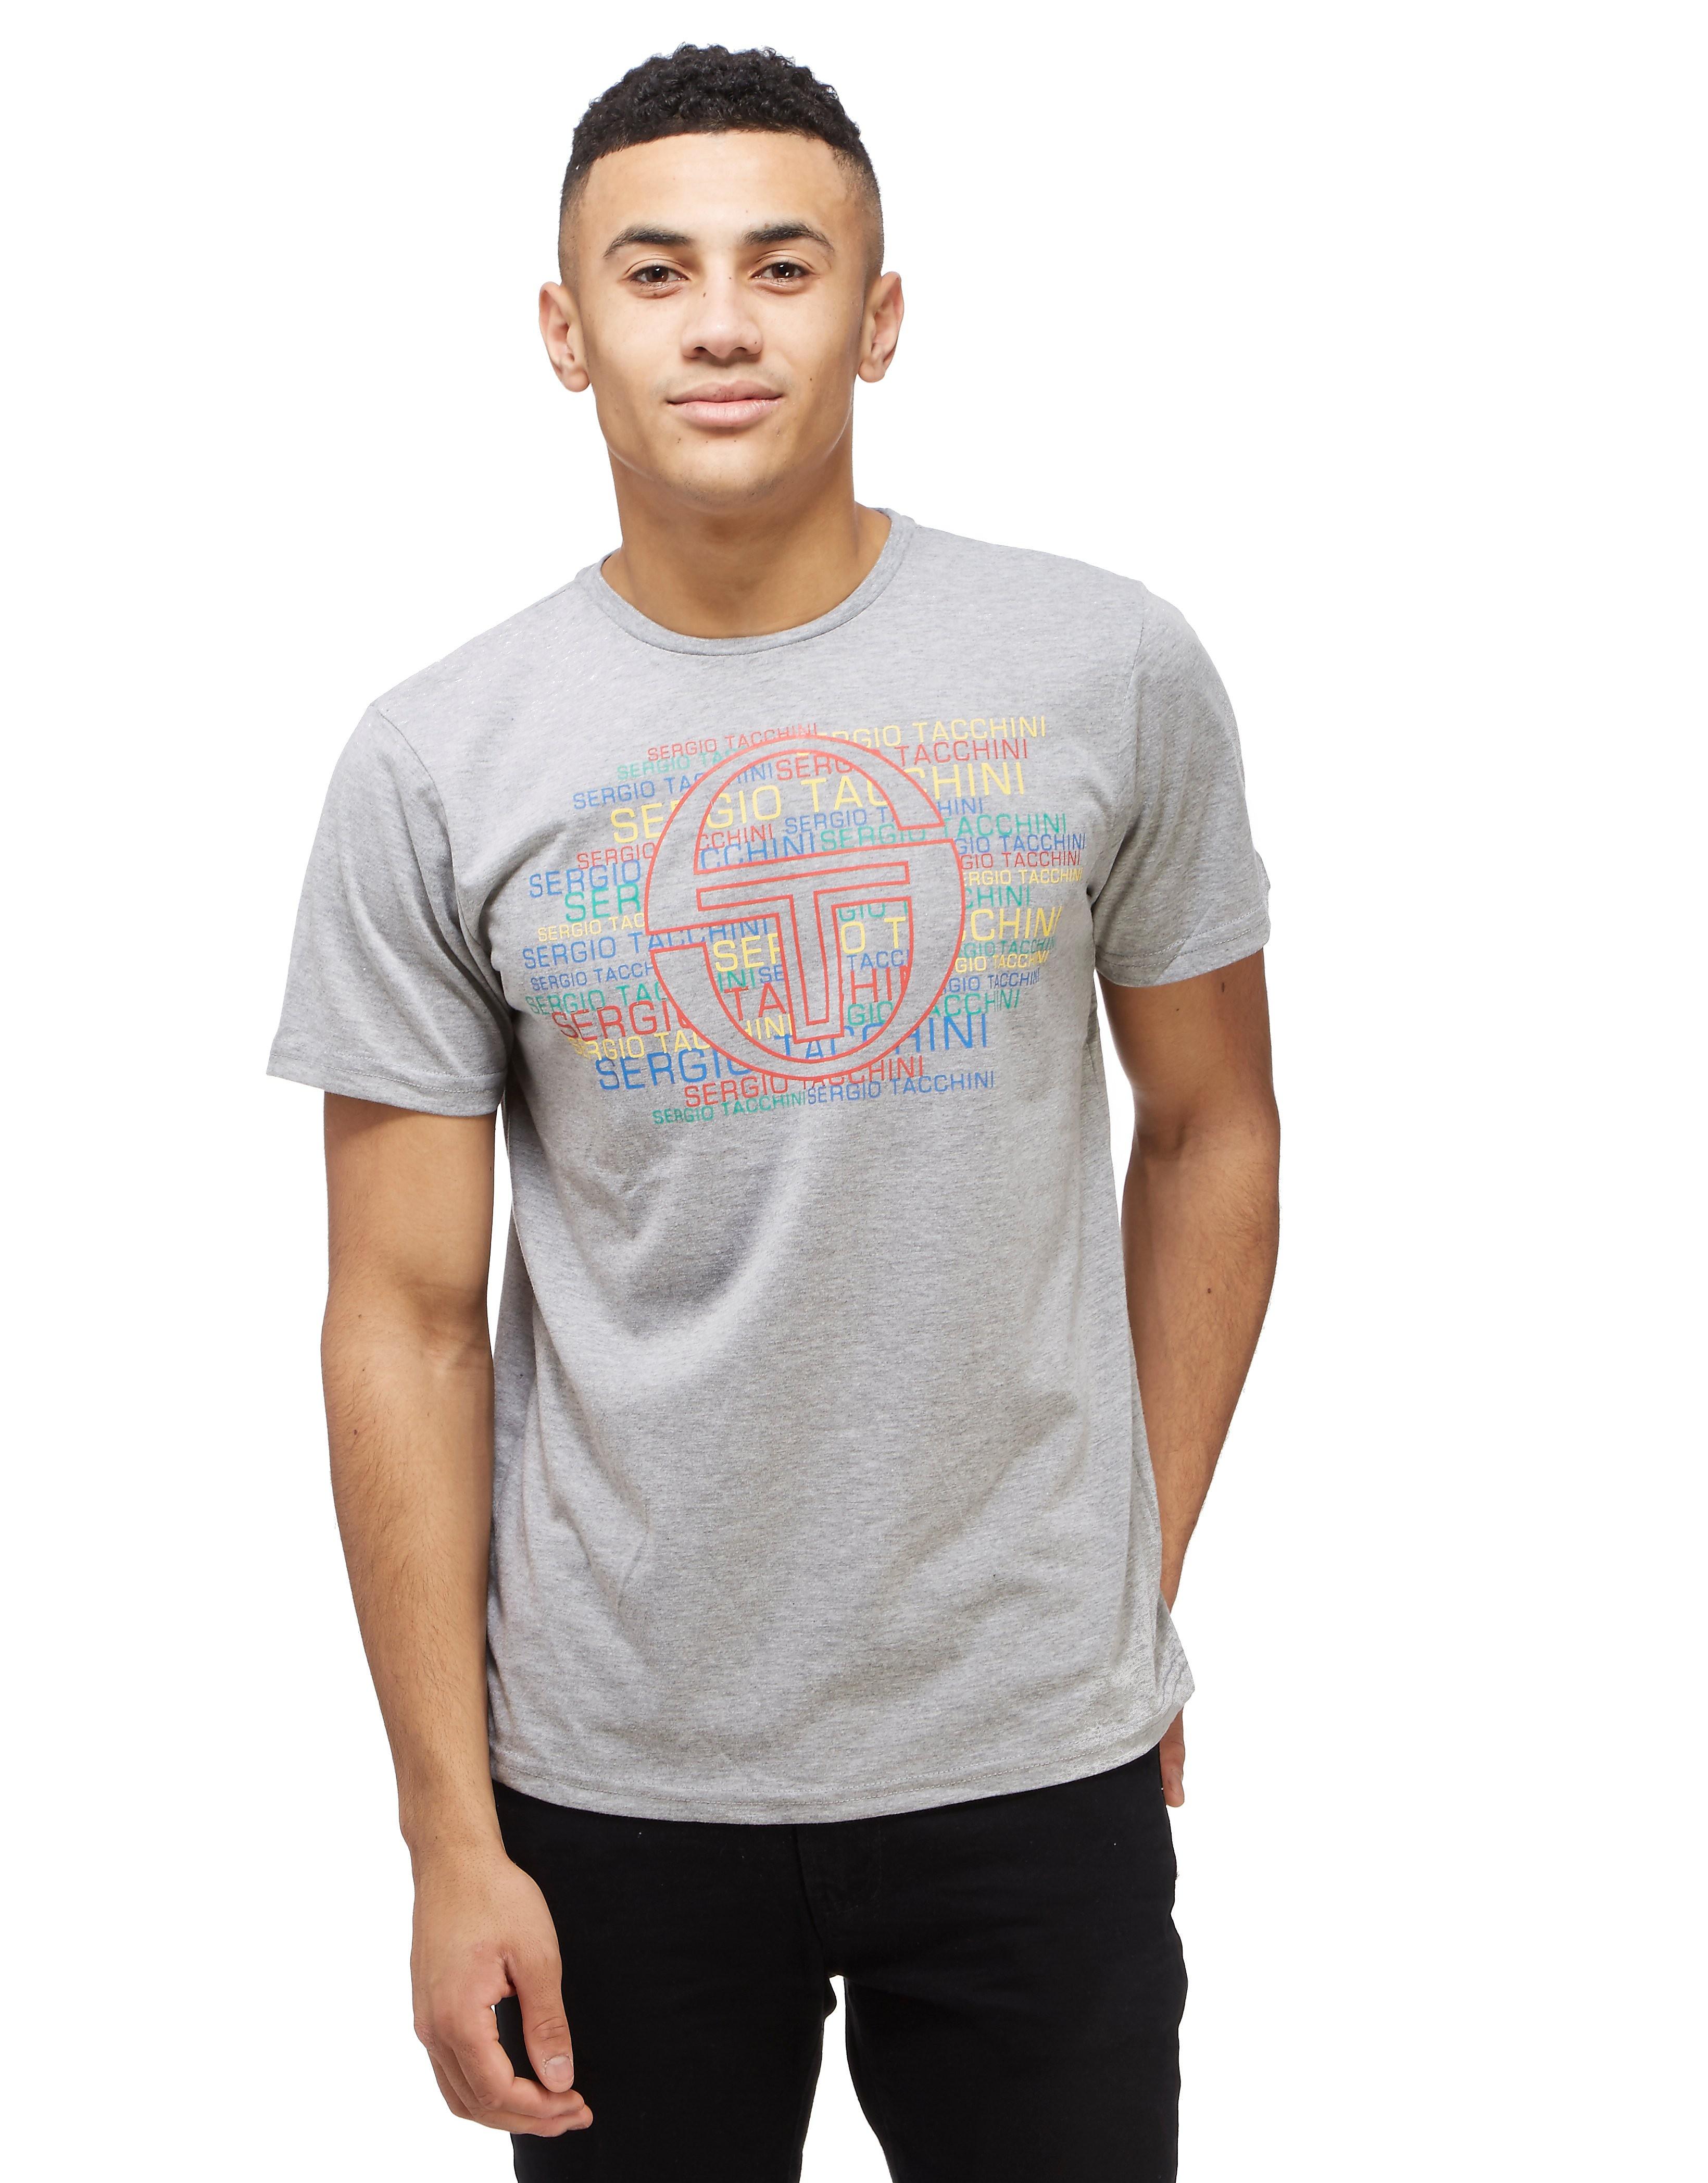 Sergio Tacchini Impact T-Shirt